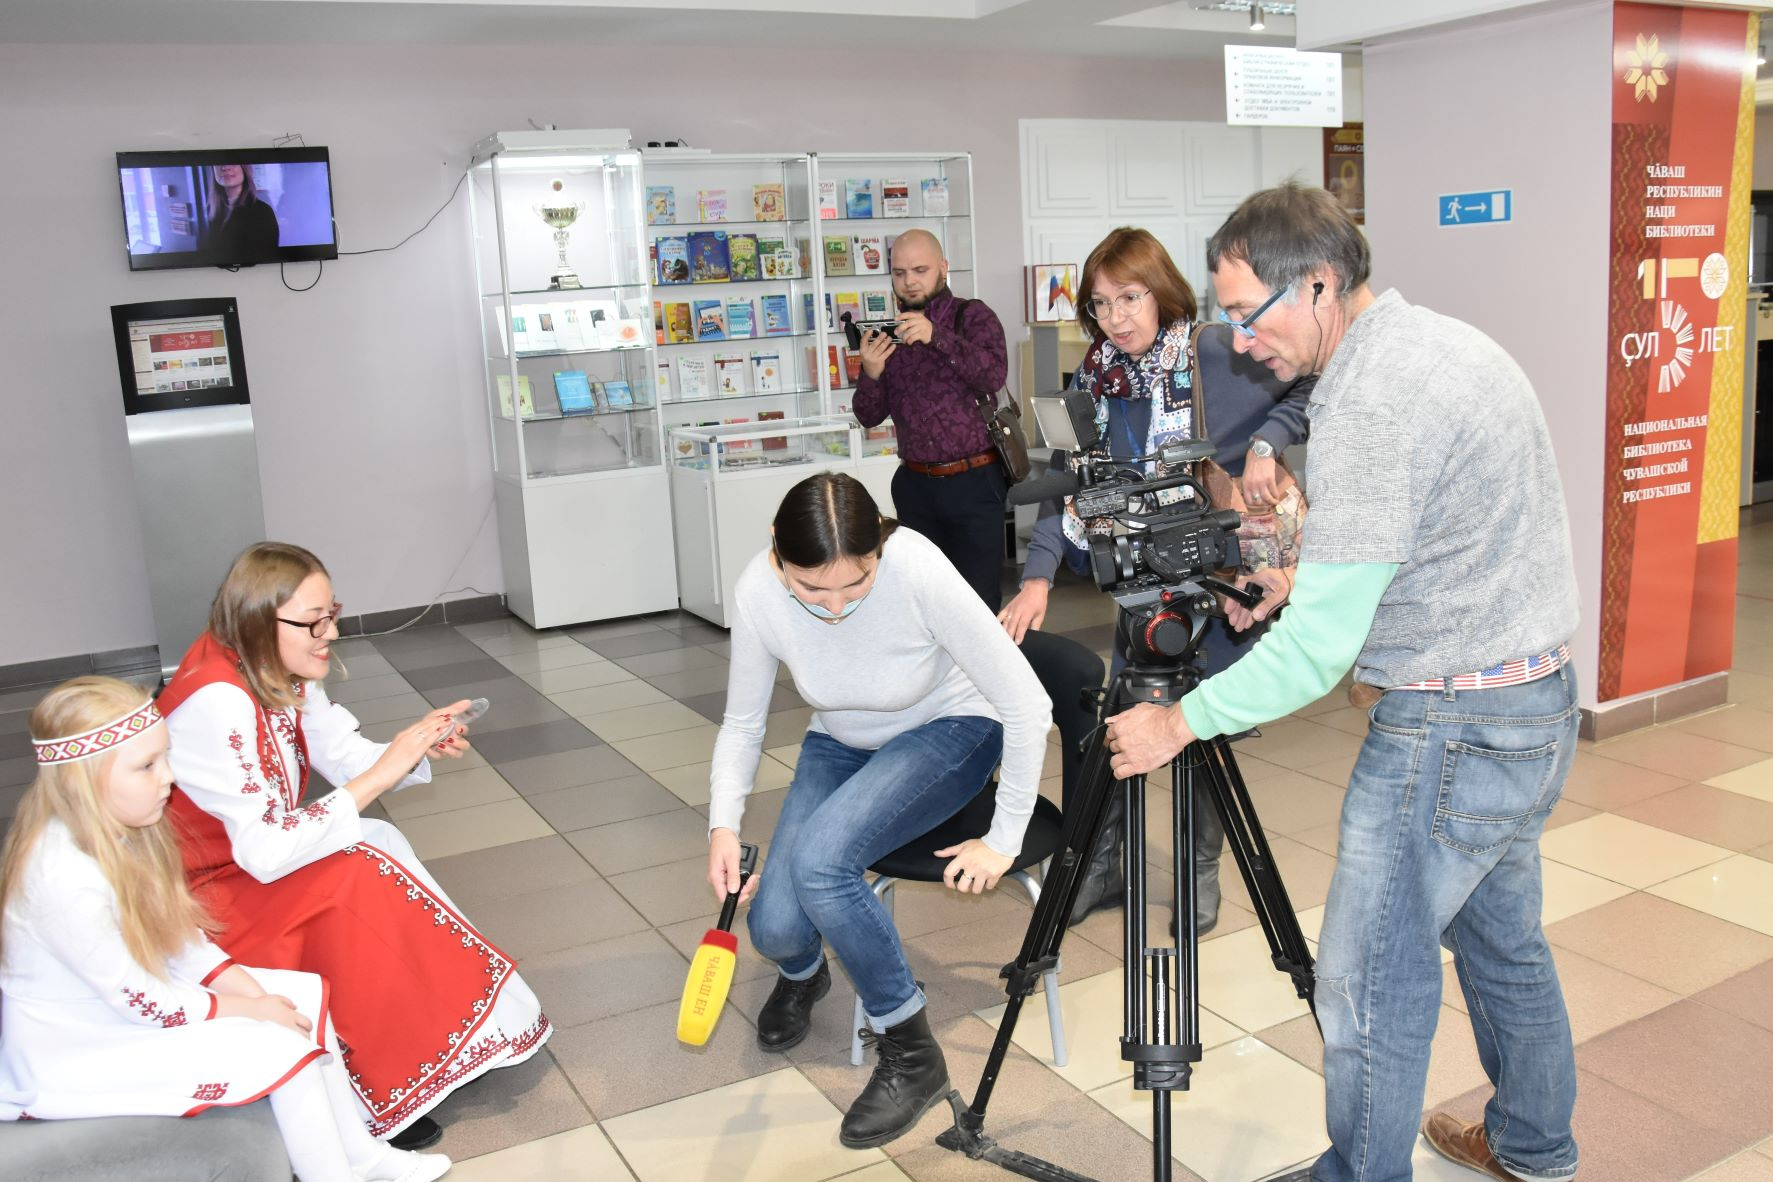 Наталья Ямаева (Йошкар-Ола), интервью коллегам